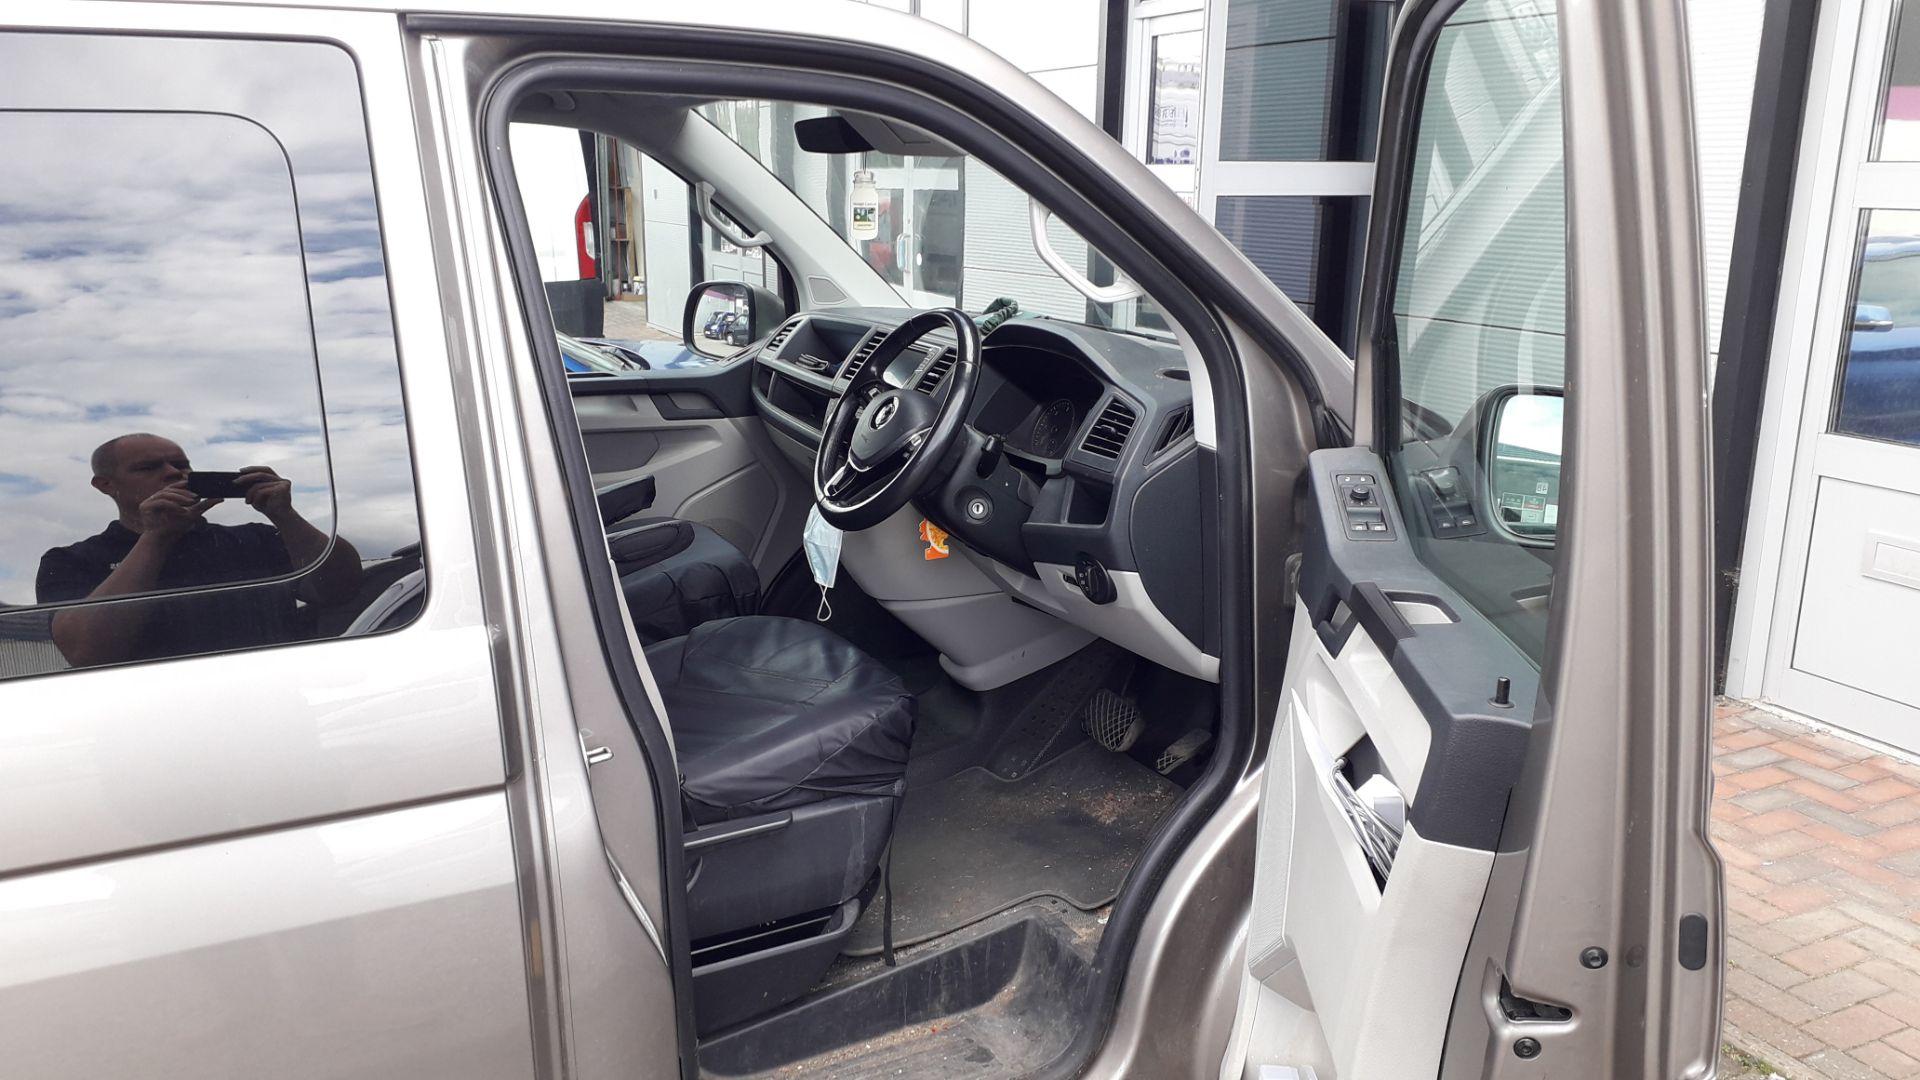 Volkswagen Transporter T30 2.0 Tdi BMT 150 Highlin - Image 12 of 18